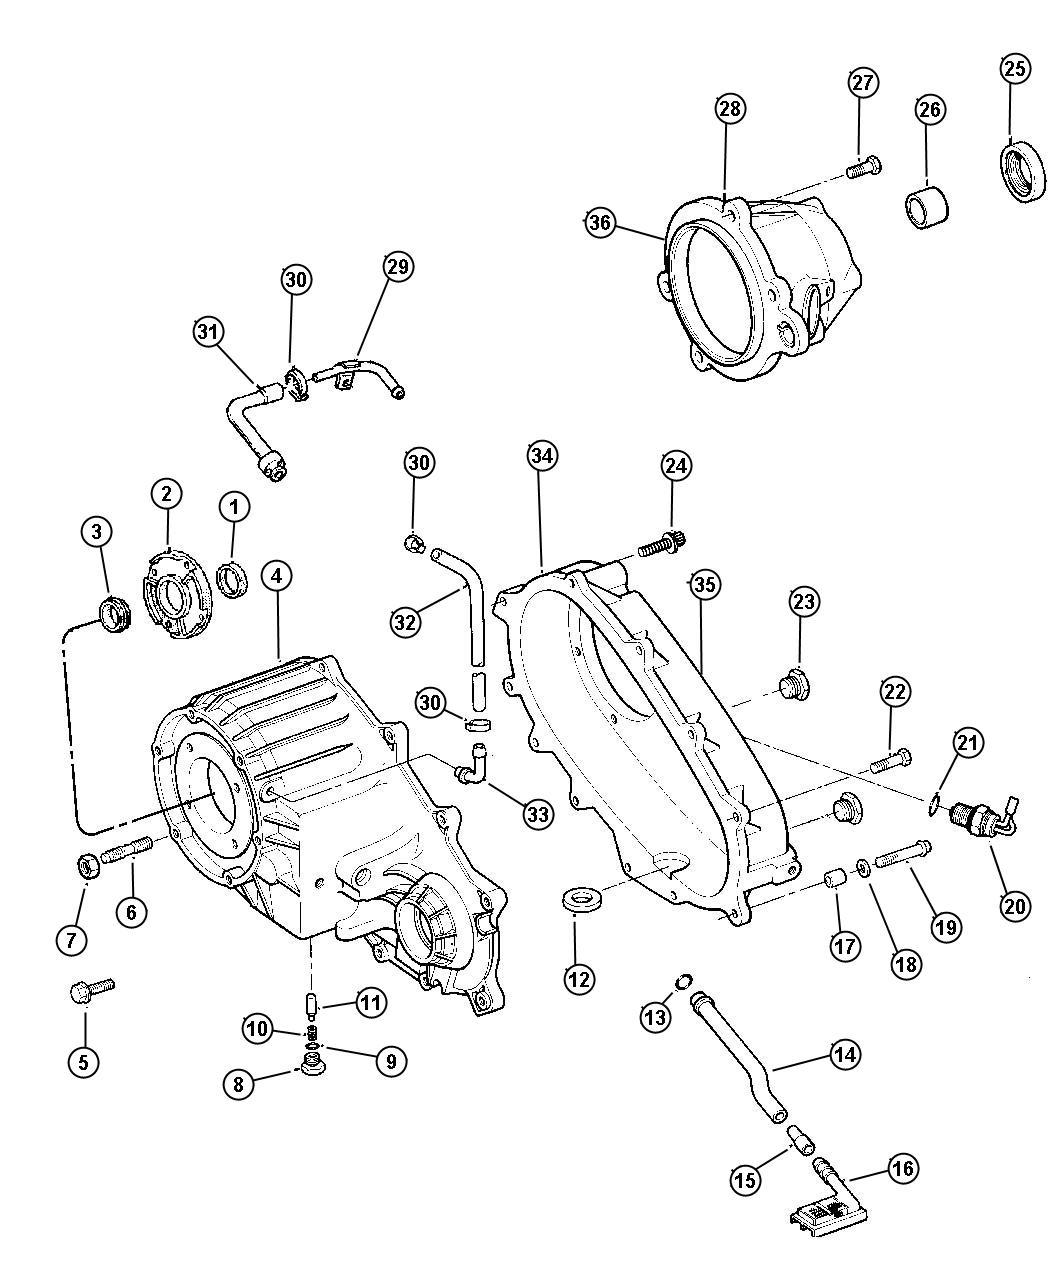 Jeep Grand Cherokee Dowel. Transfer case. Dhc, dhr